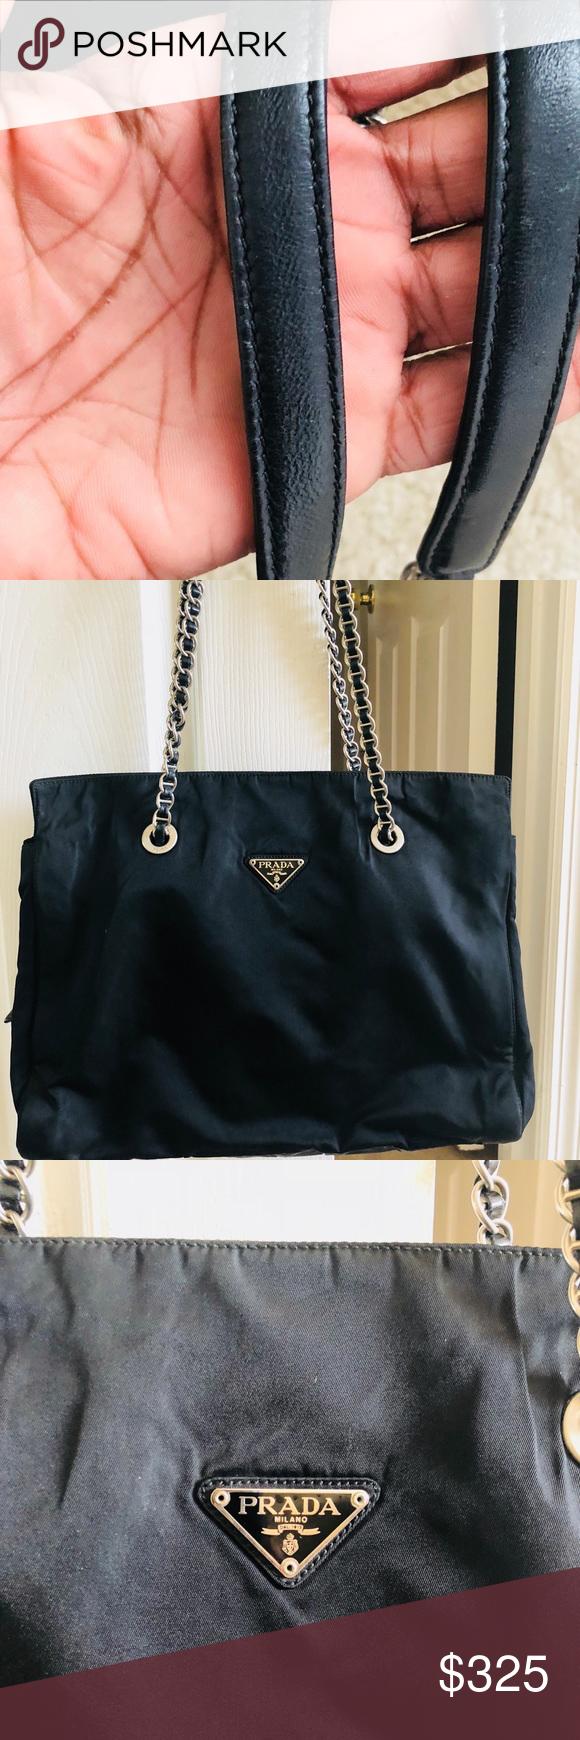 0185000a1fde Vintage Authentic PRADA Nylon Shoulder Bag Vintage Prada Bag is an original  strap soft bag. Large bag with a center zipper pouch and two size pockets.